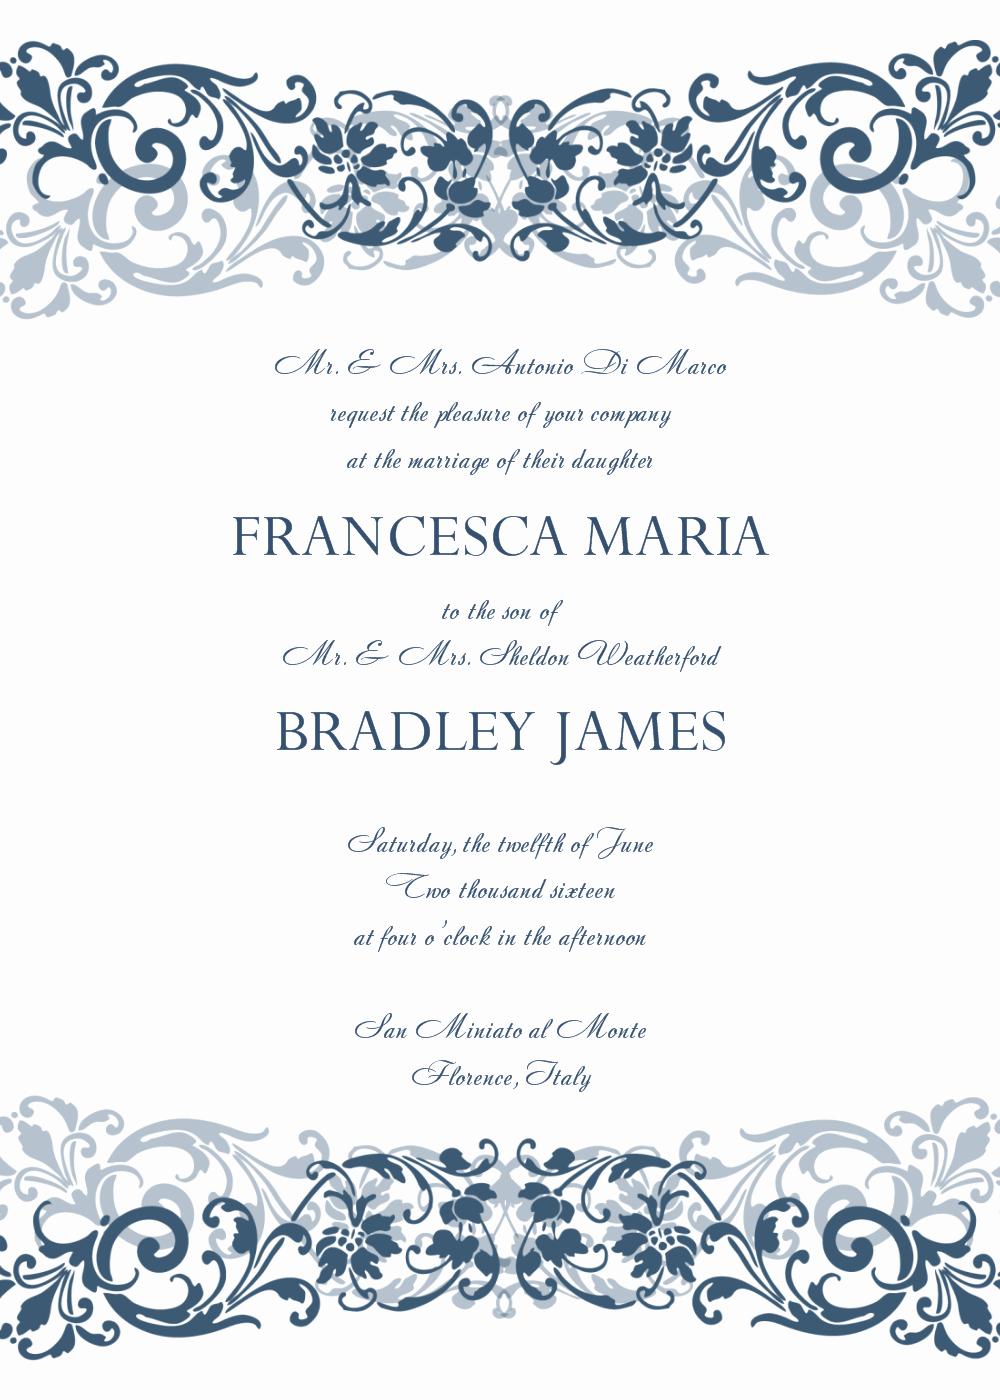 Free Online Invitation Templates Elegant 8 Free Wedding Invitation Templates Excel Pdf formats